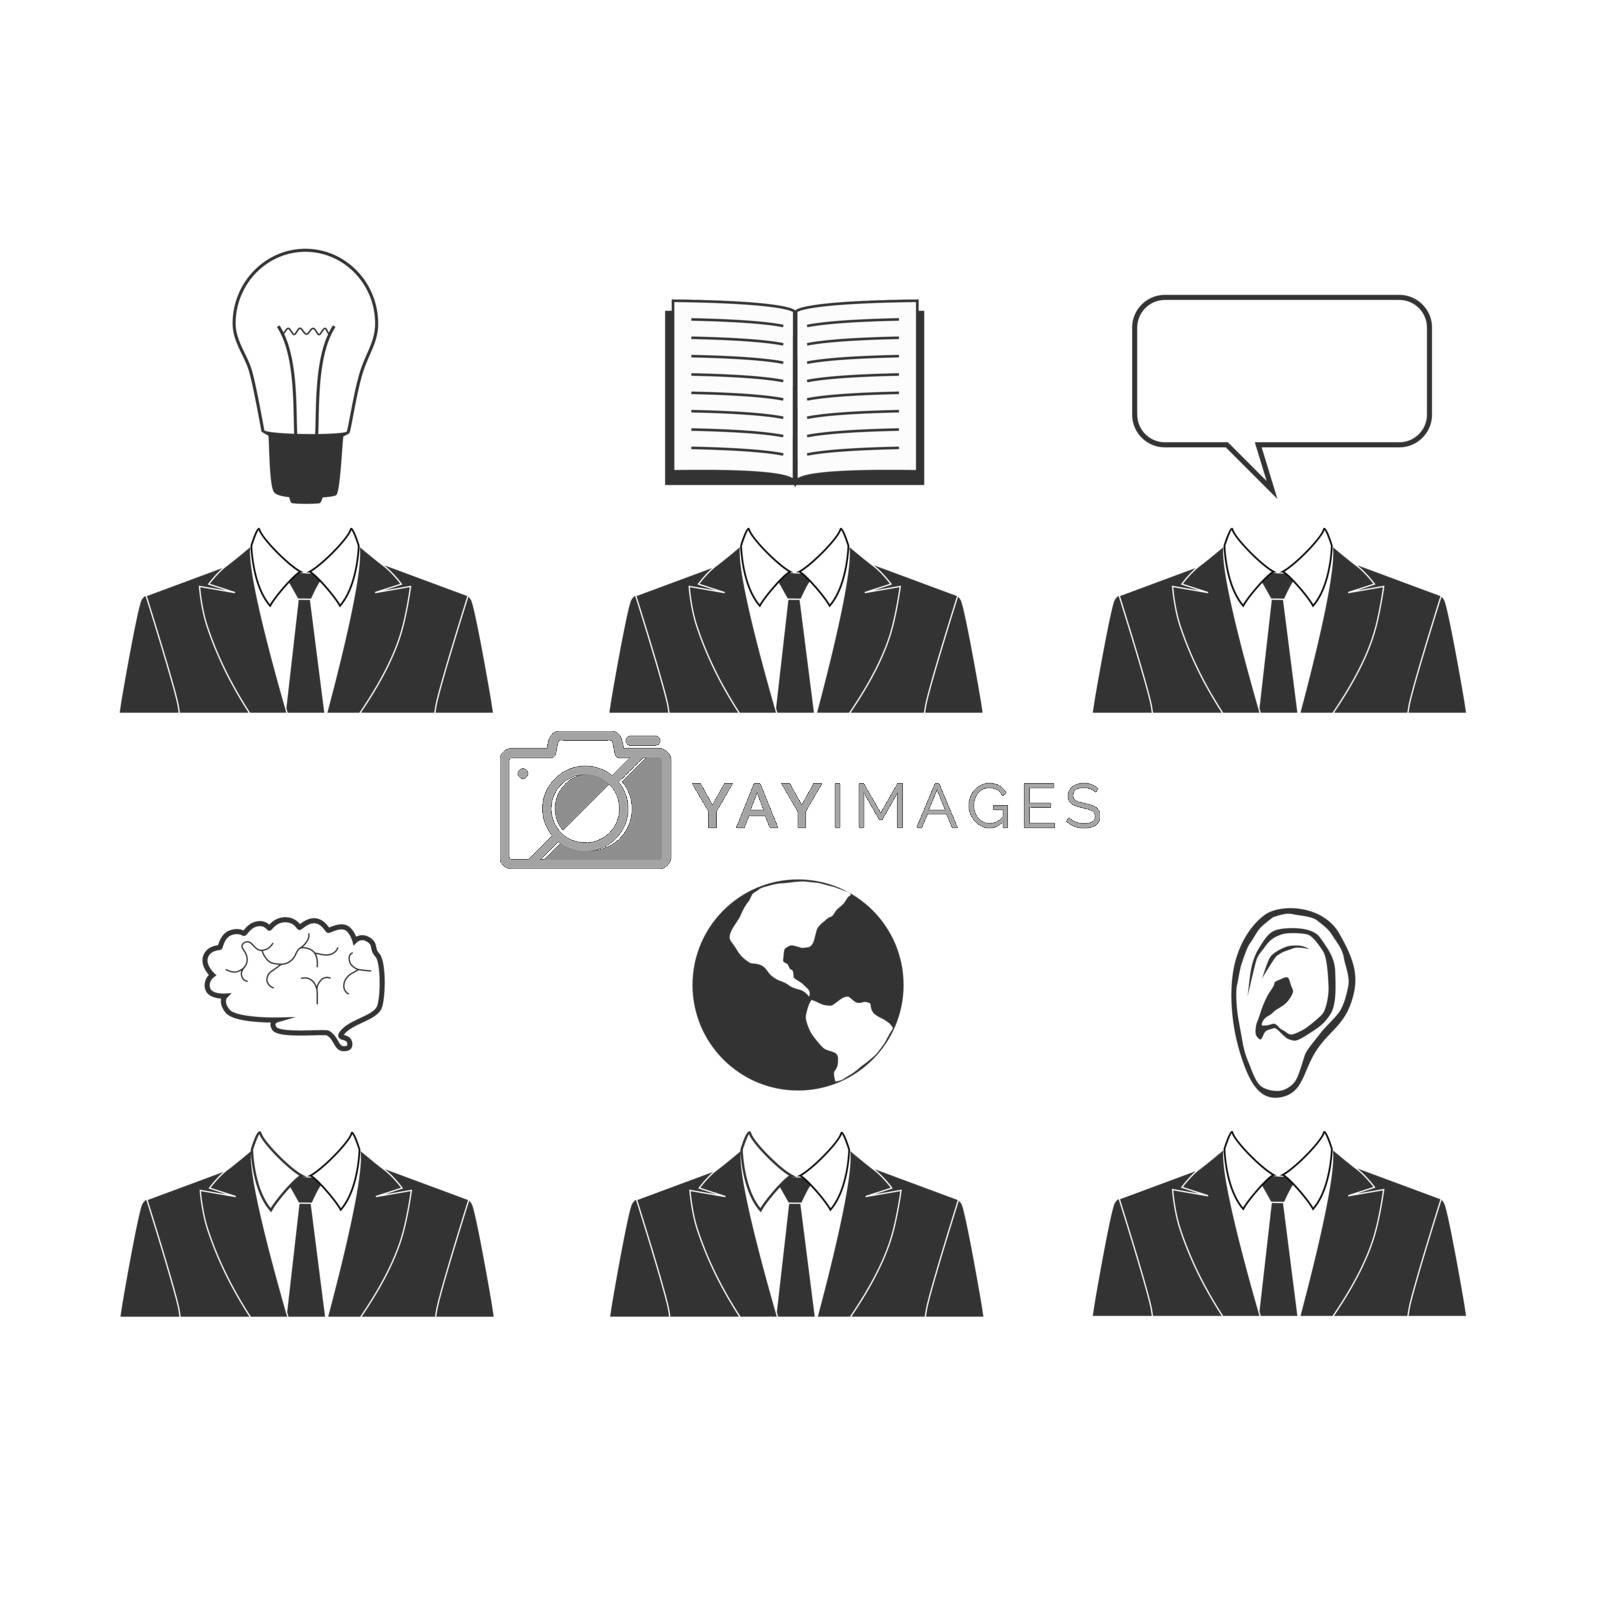 Education and business simple icon set. Symbols for knowledge, success, idea, communication. Black flat signs: light bulb, speech bubble, speech cloud. Vector illustration listen read think